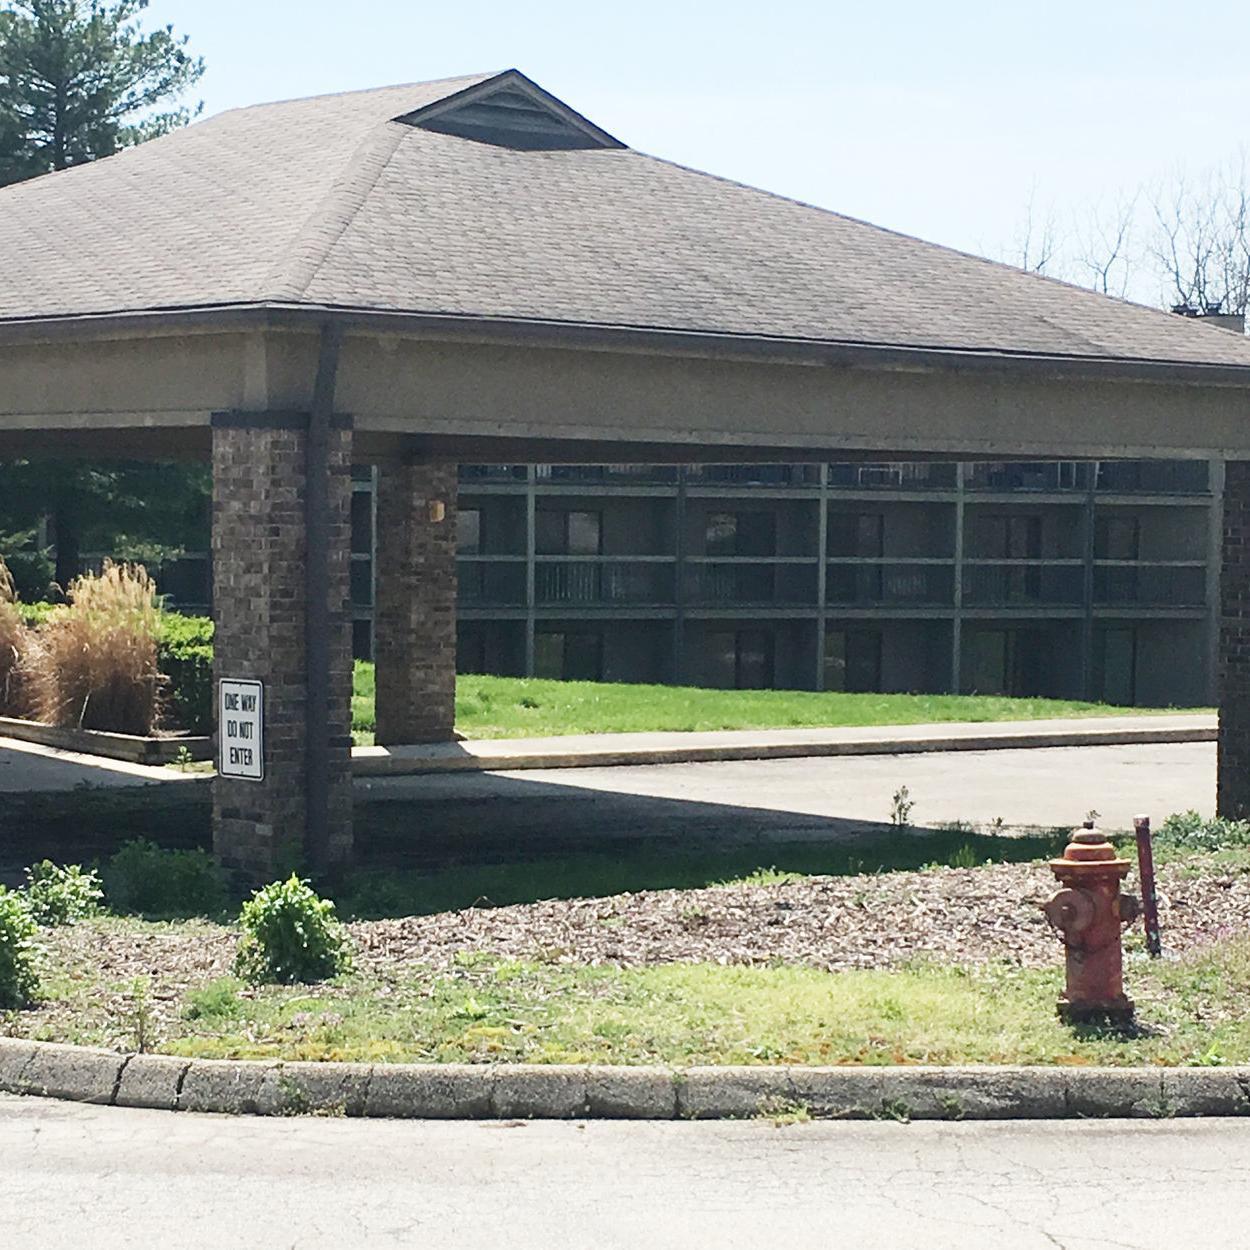 IDNR again seeking bids to redevelop Eagle Creek Resort on